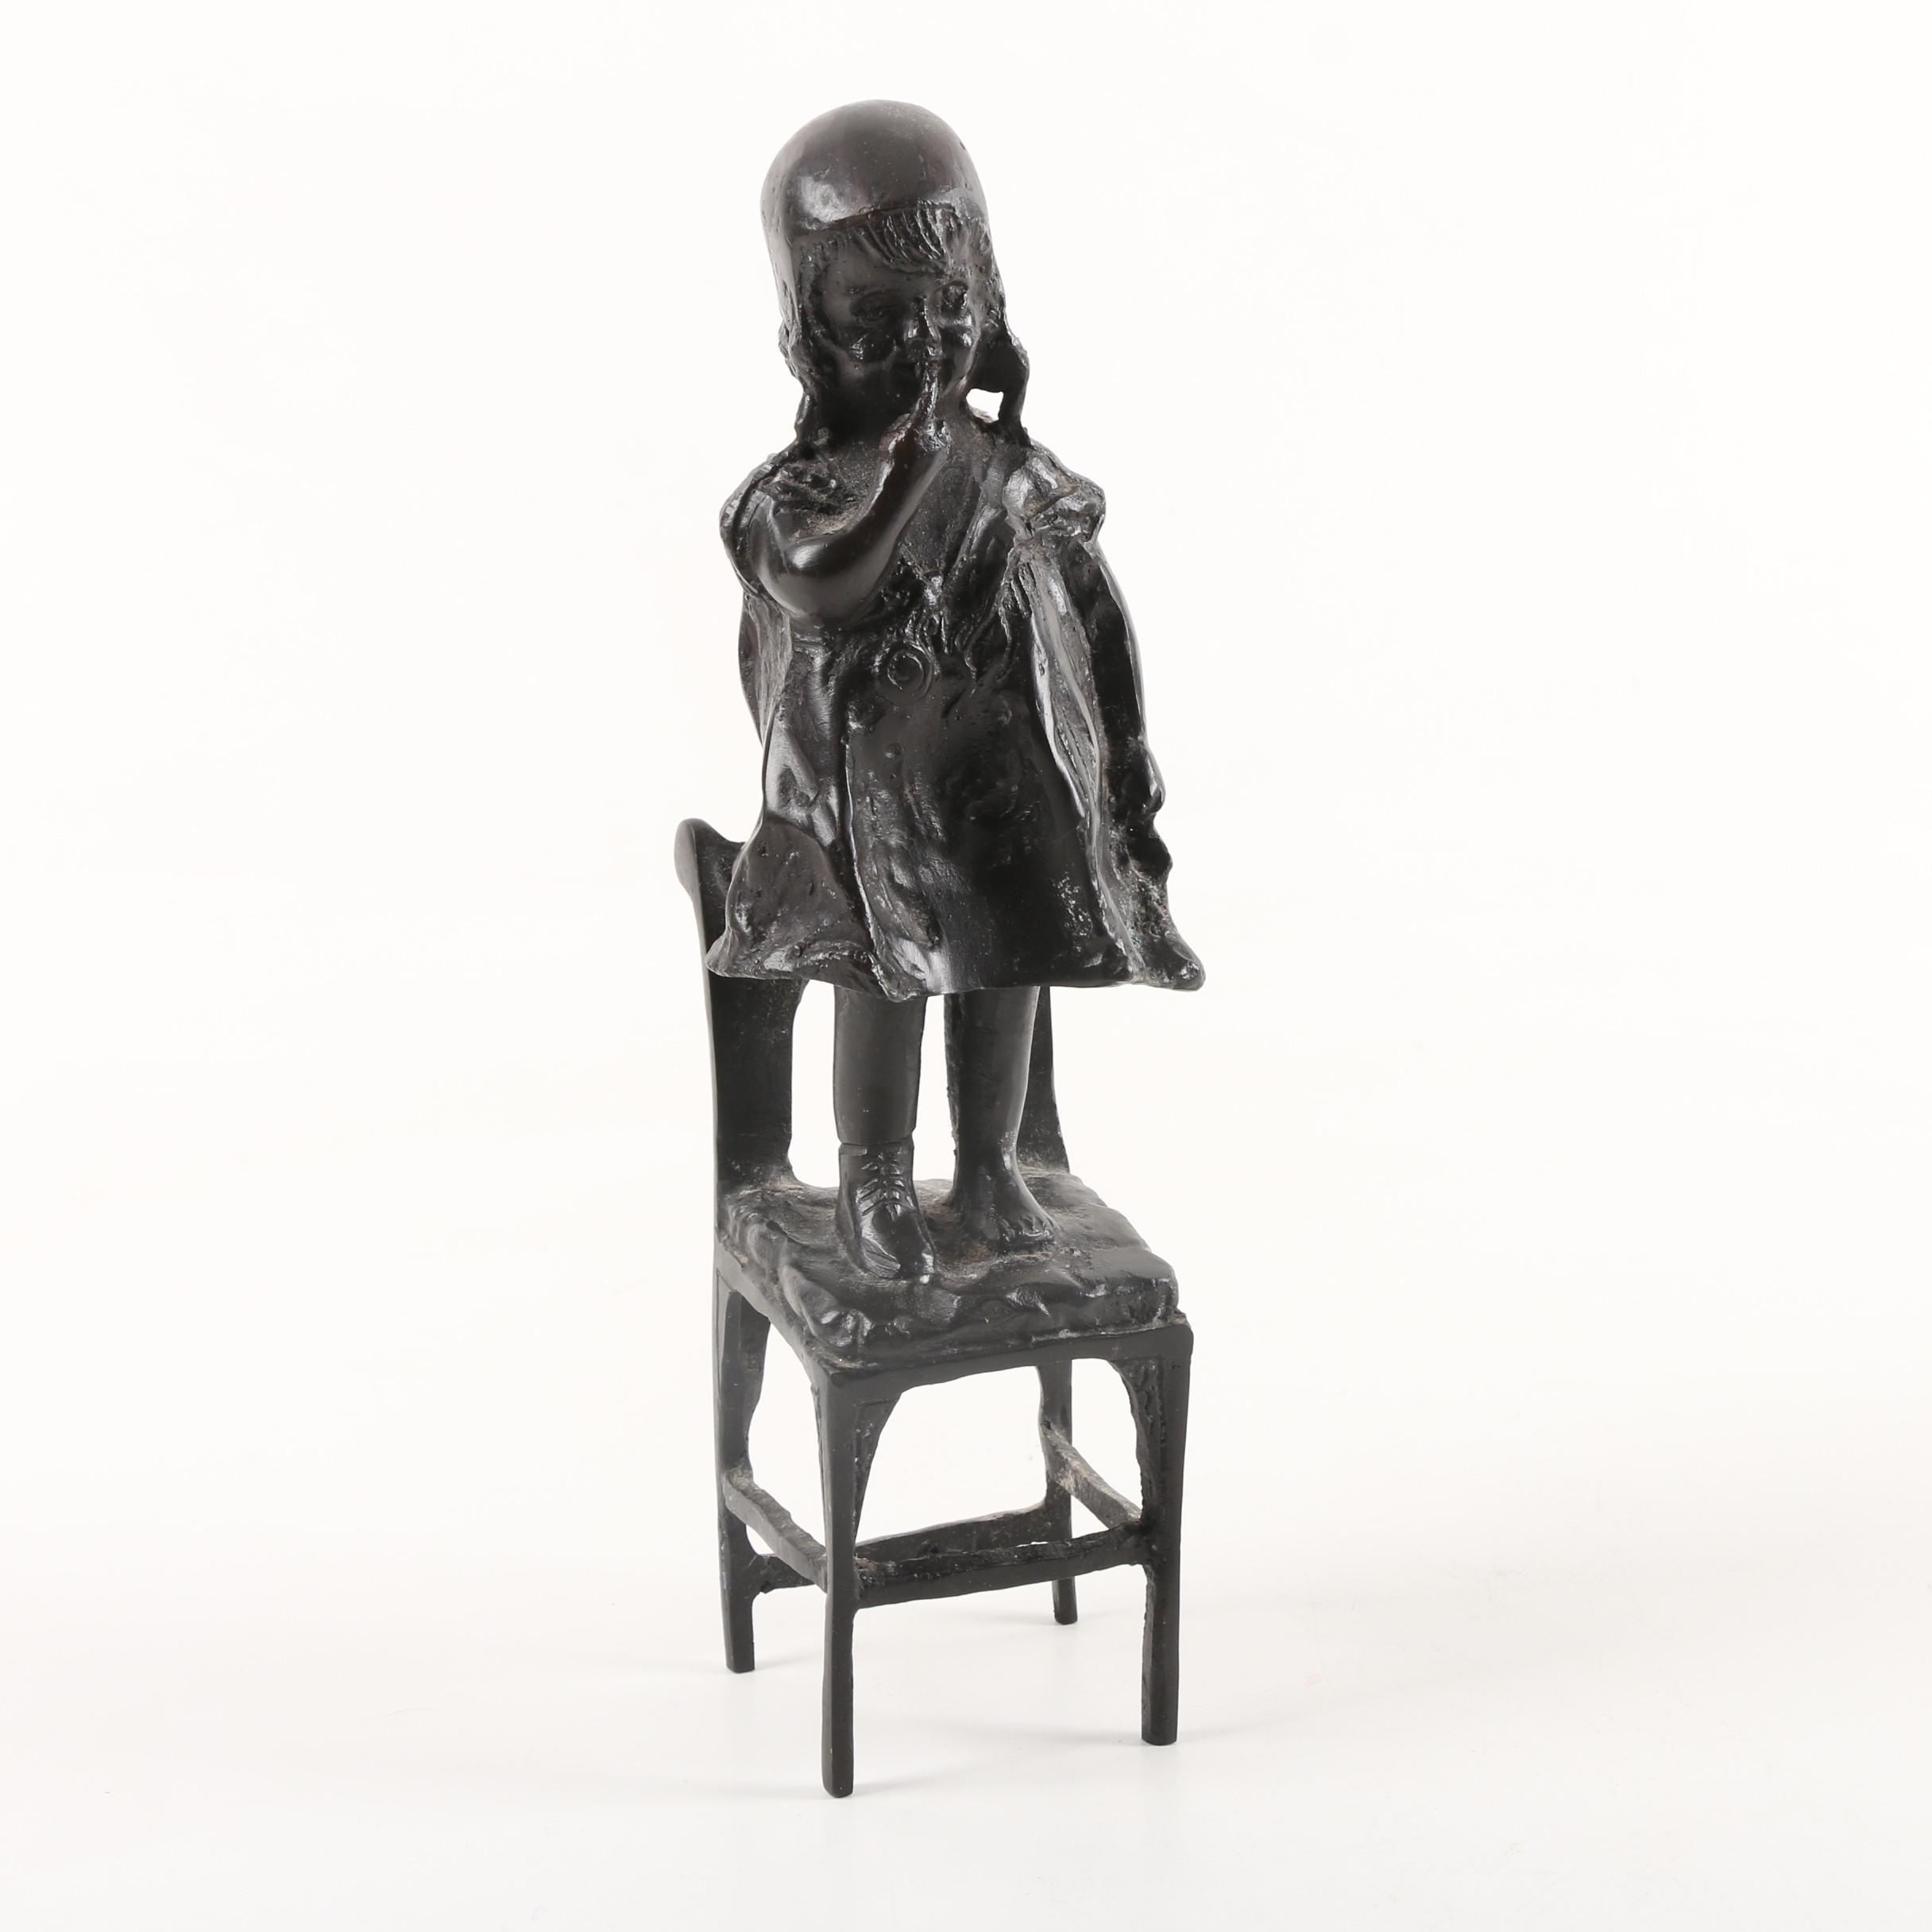 Vintage Cast Metal Figurine of Girl on Chair